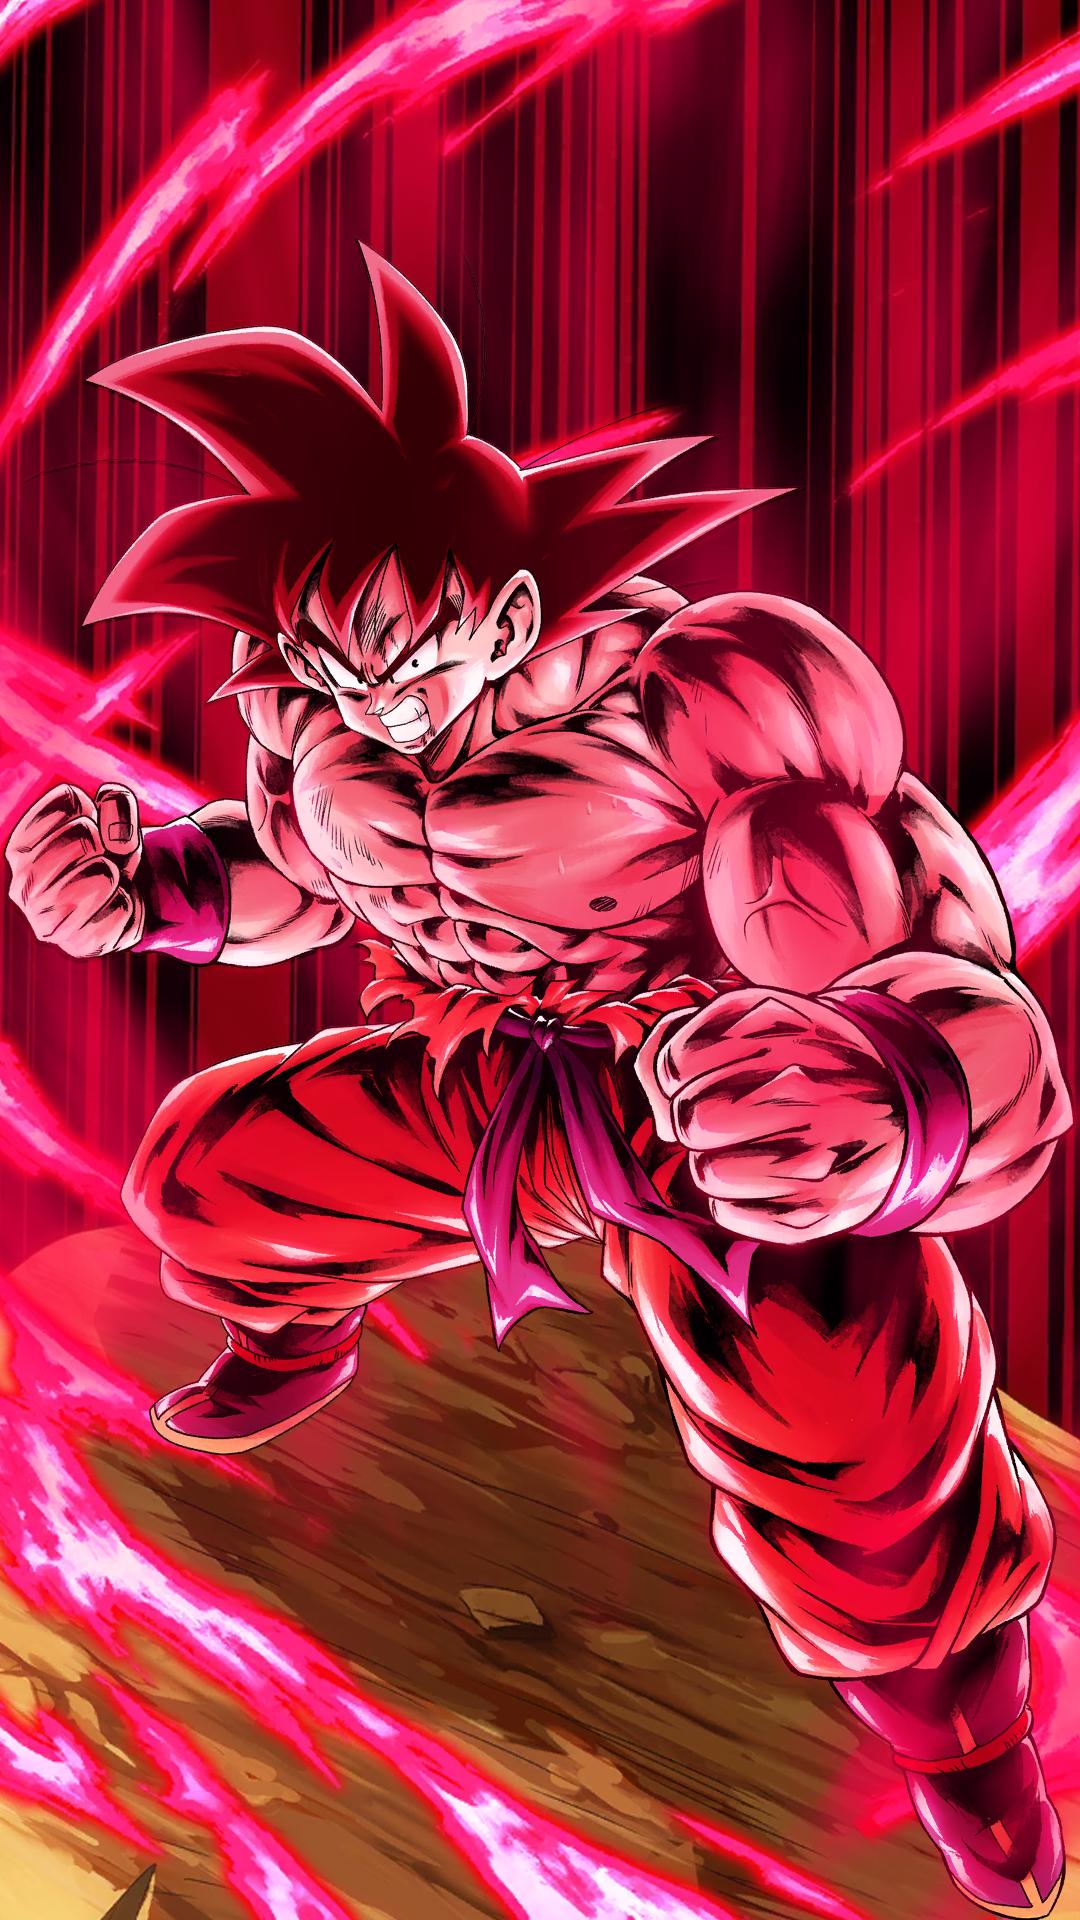 Goku Kaioken Wallpapers   Top Goku Kaioken Backgrounds 1080x1920